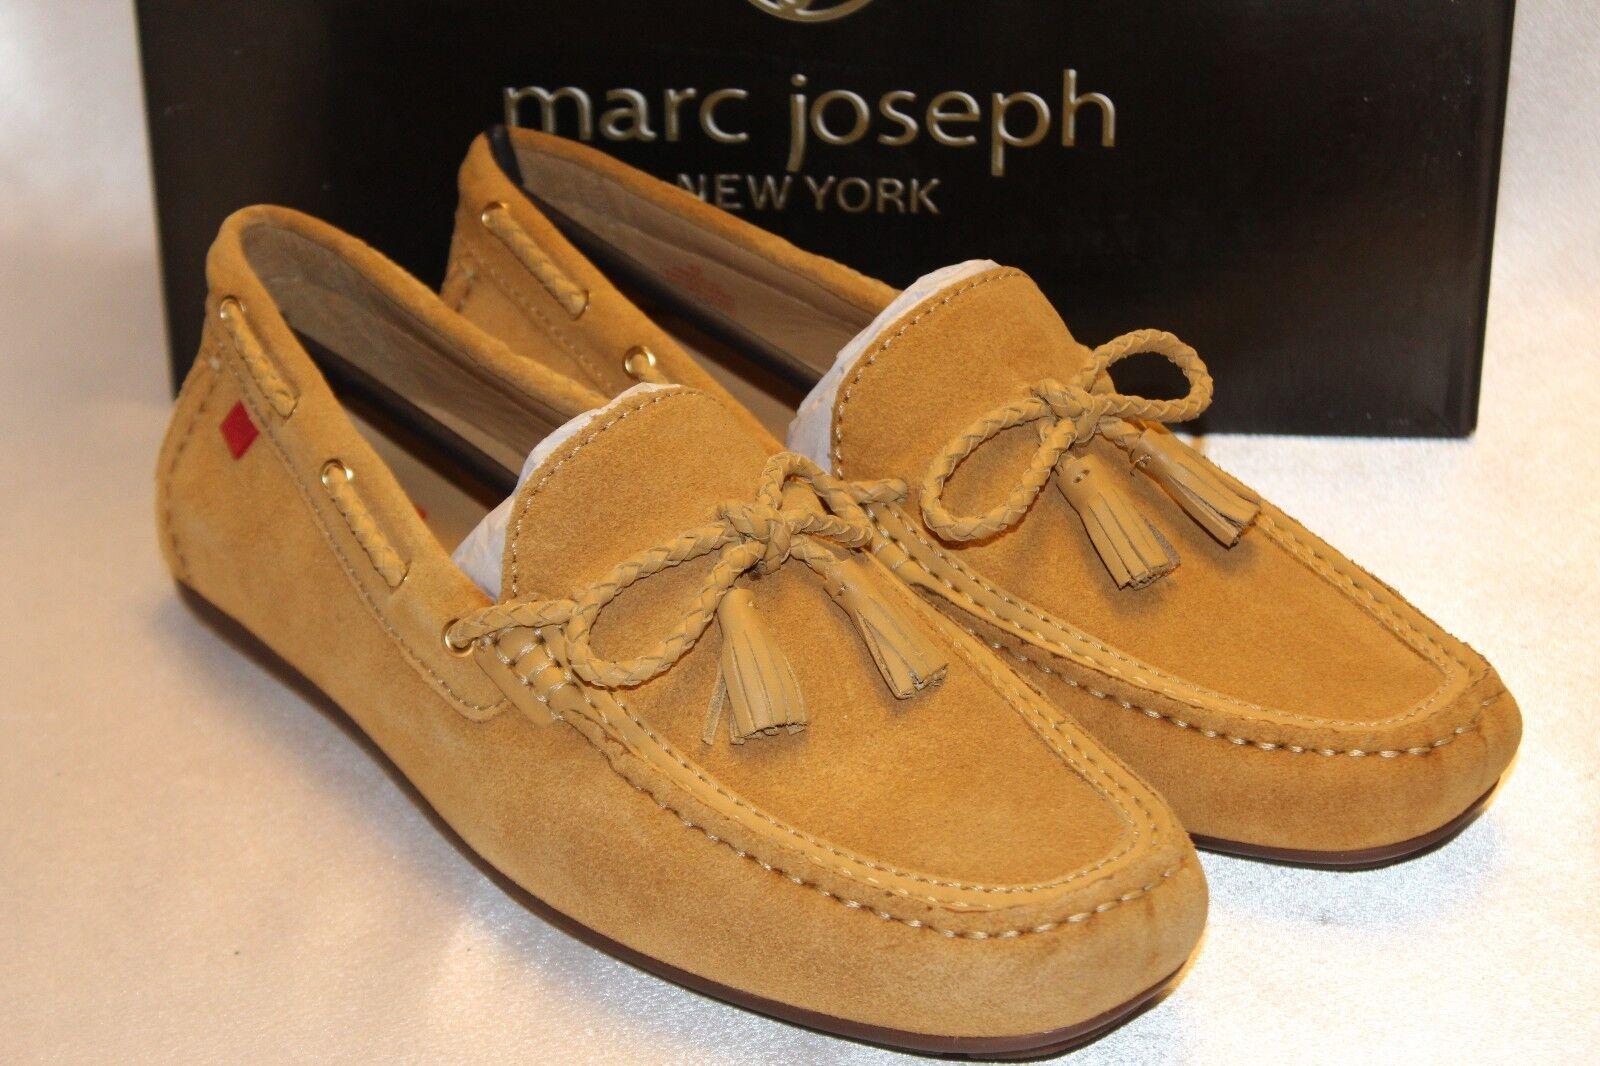 NEW! NIB! MARC JOSEPH Citrus Tan Suede PRINCE ST Driving Moccasin Shoes 10 EU42